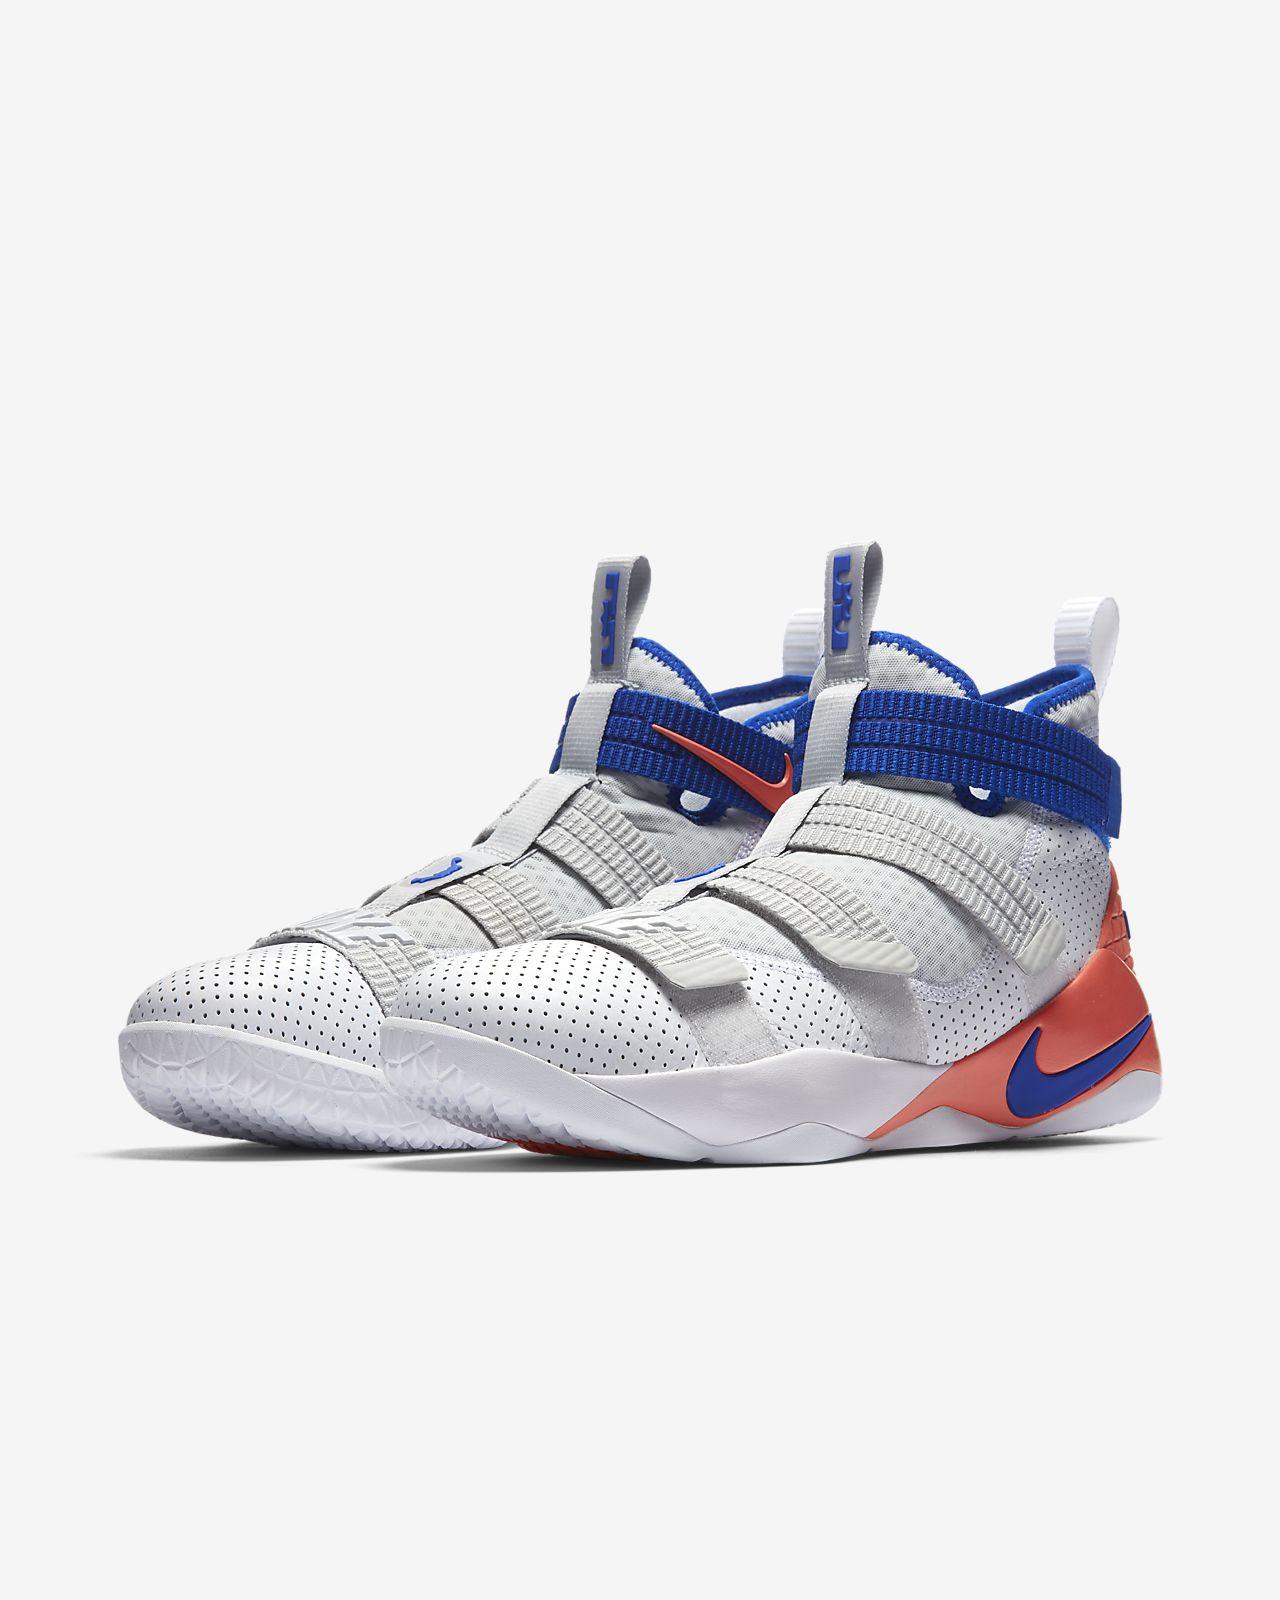 Lebron Soldier Xi Sfg Basketball Shoe Nike Com In